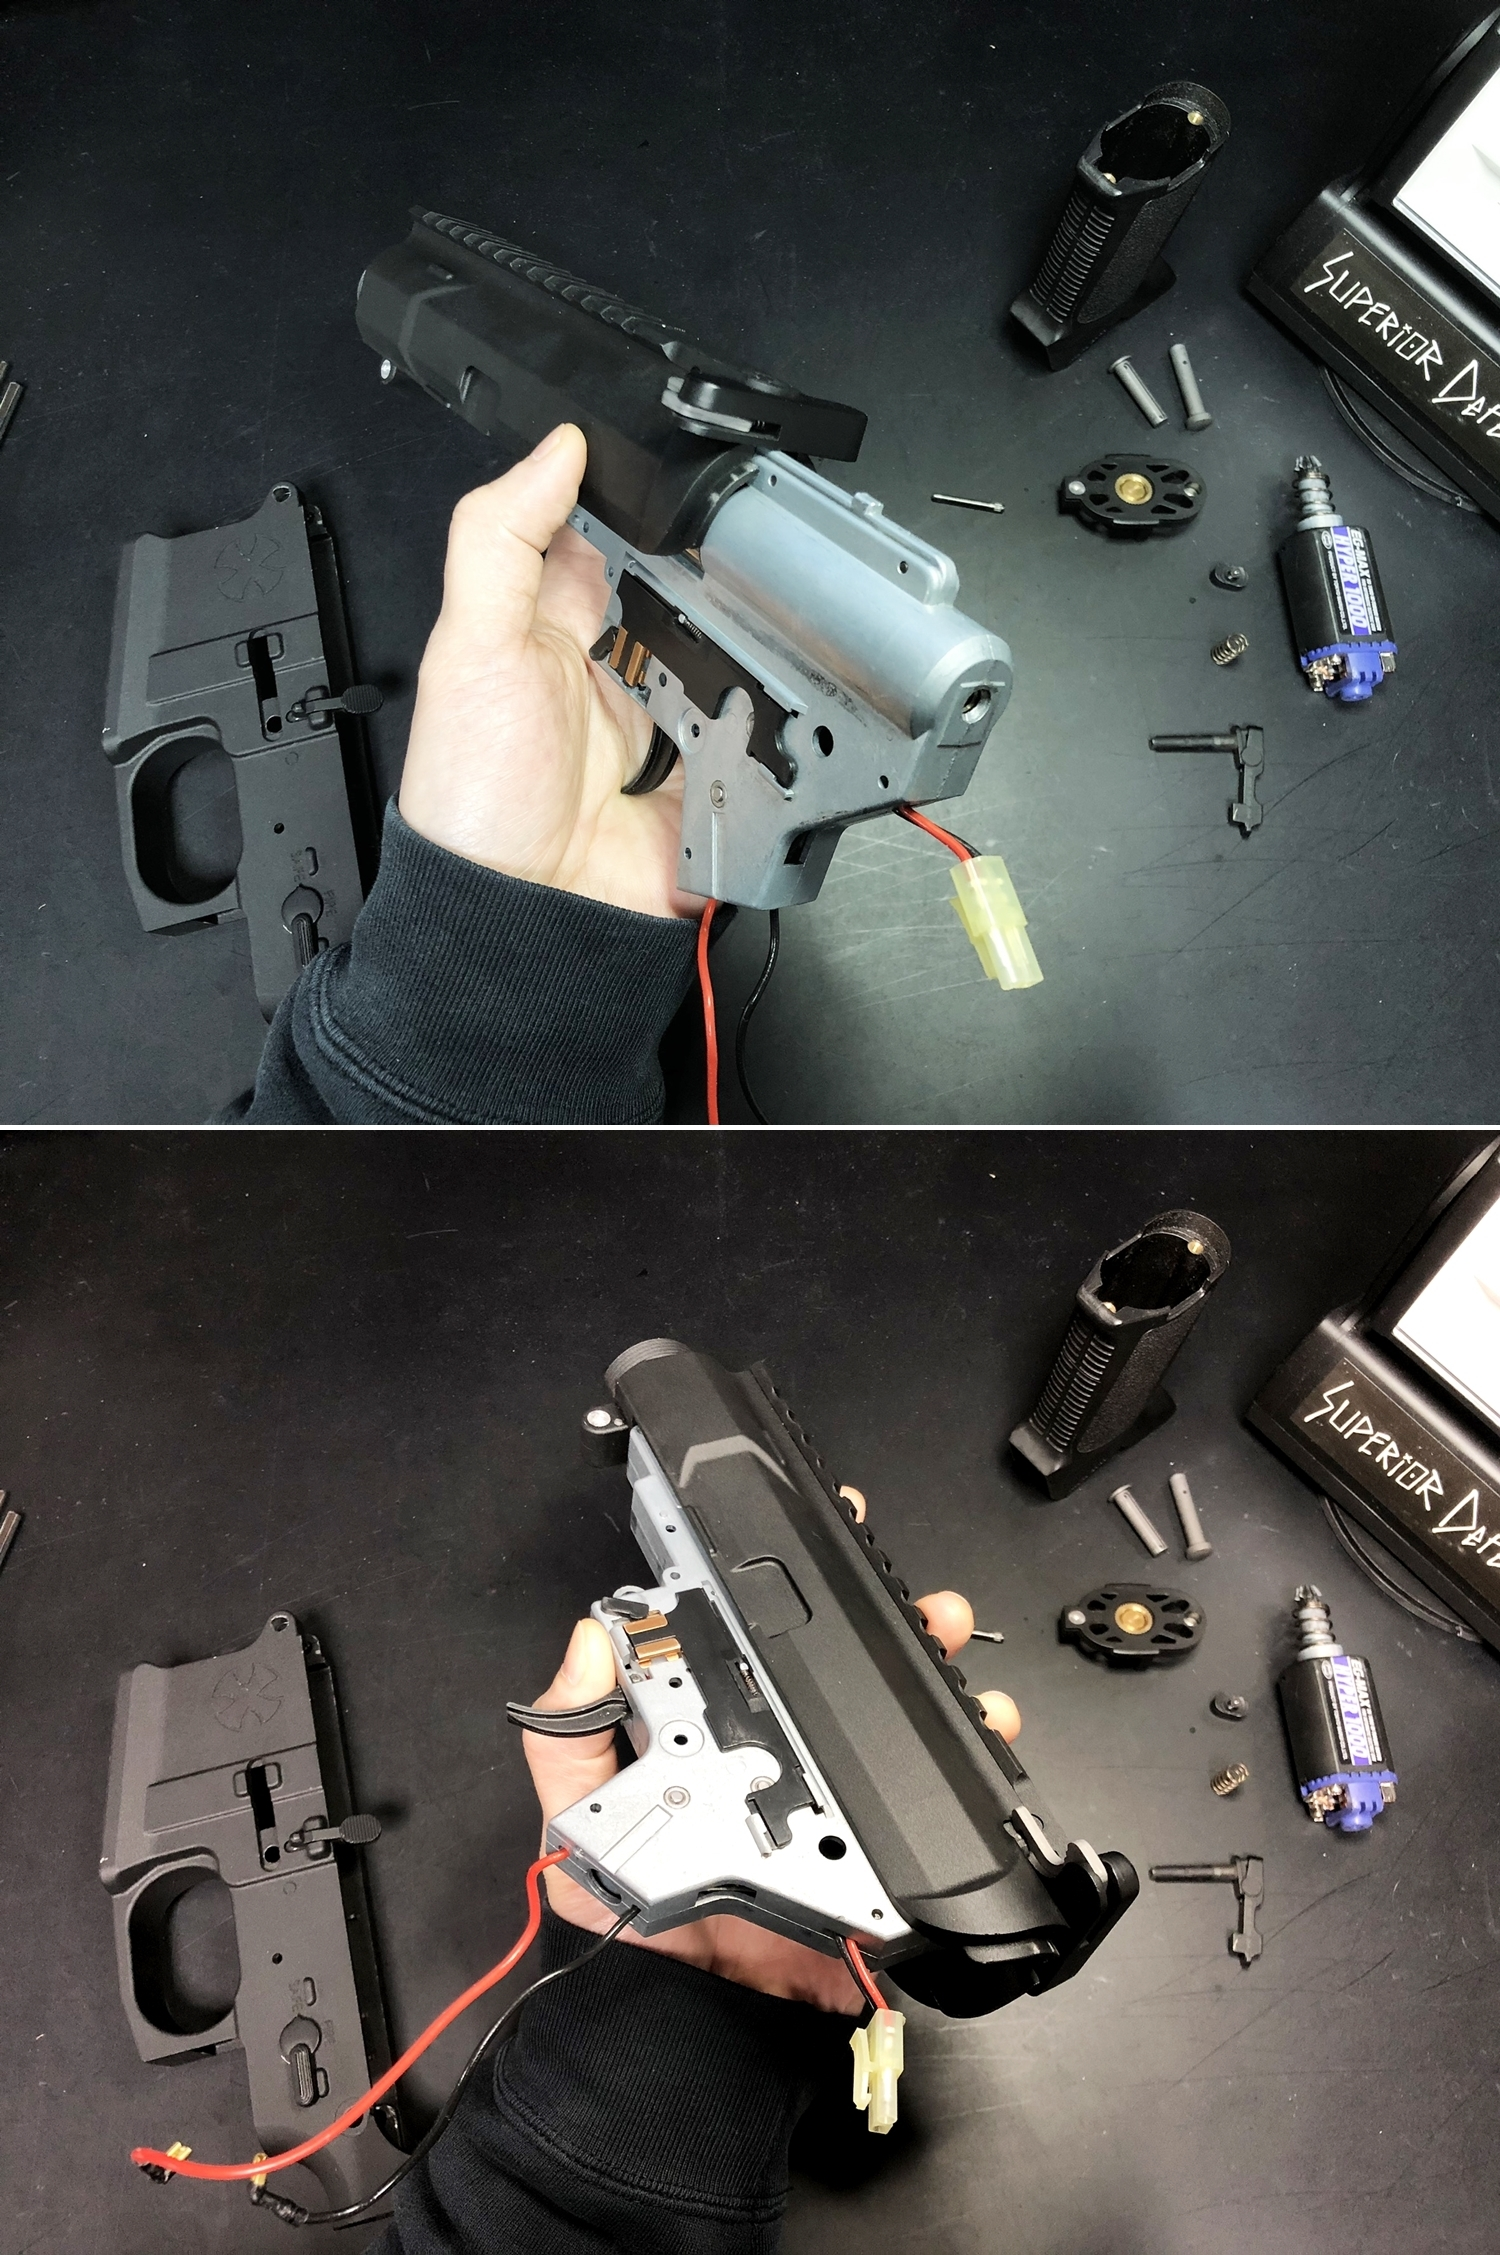 21 NOVESKE GEN3 N4 BY MADBULL!! 『第一弾』 新たにSTD民間系ARを作り始めたいと思います!! STD AR-15 M4 スタンダード 電動ガン マルイ ノベスケ ノベスキー マットブル メタルフレーム 動作テスト 組込 取付 カス